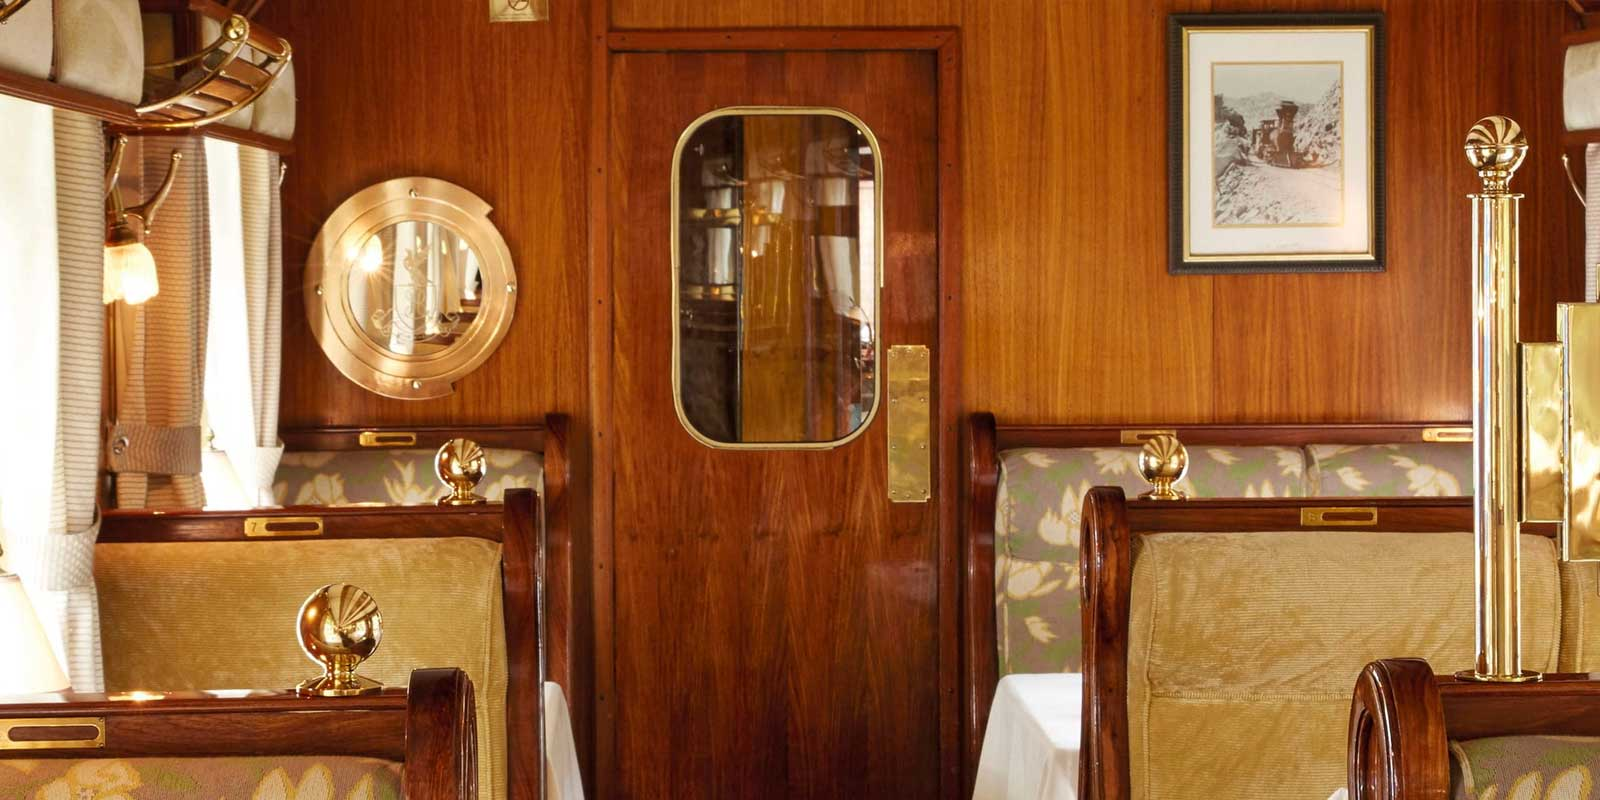 Dining aboard the Belmond Hiram Bingham